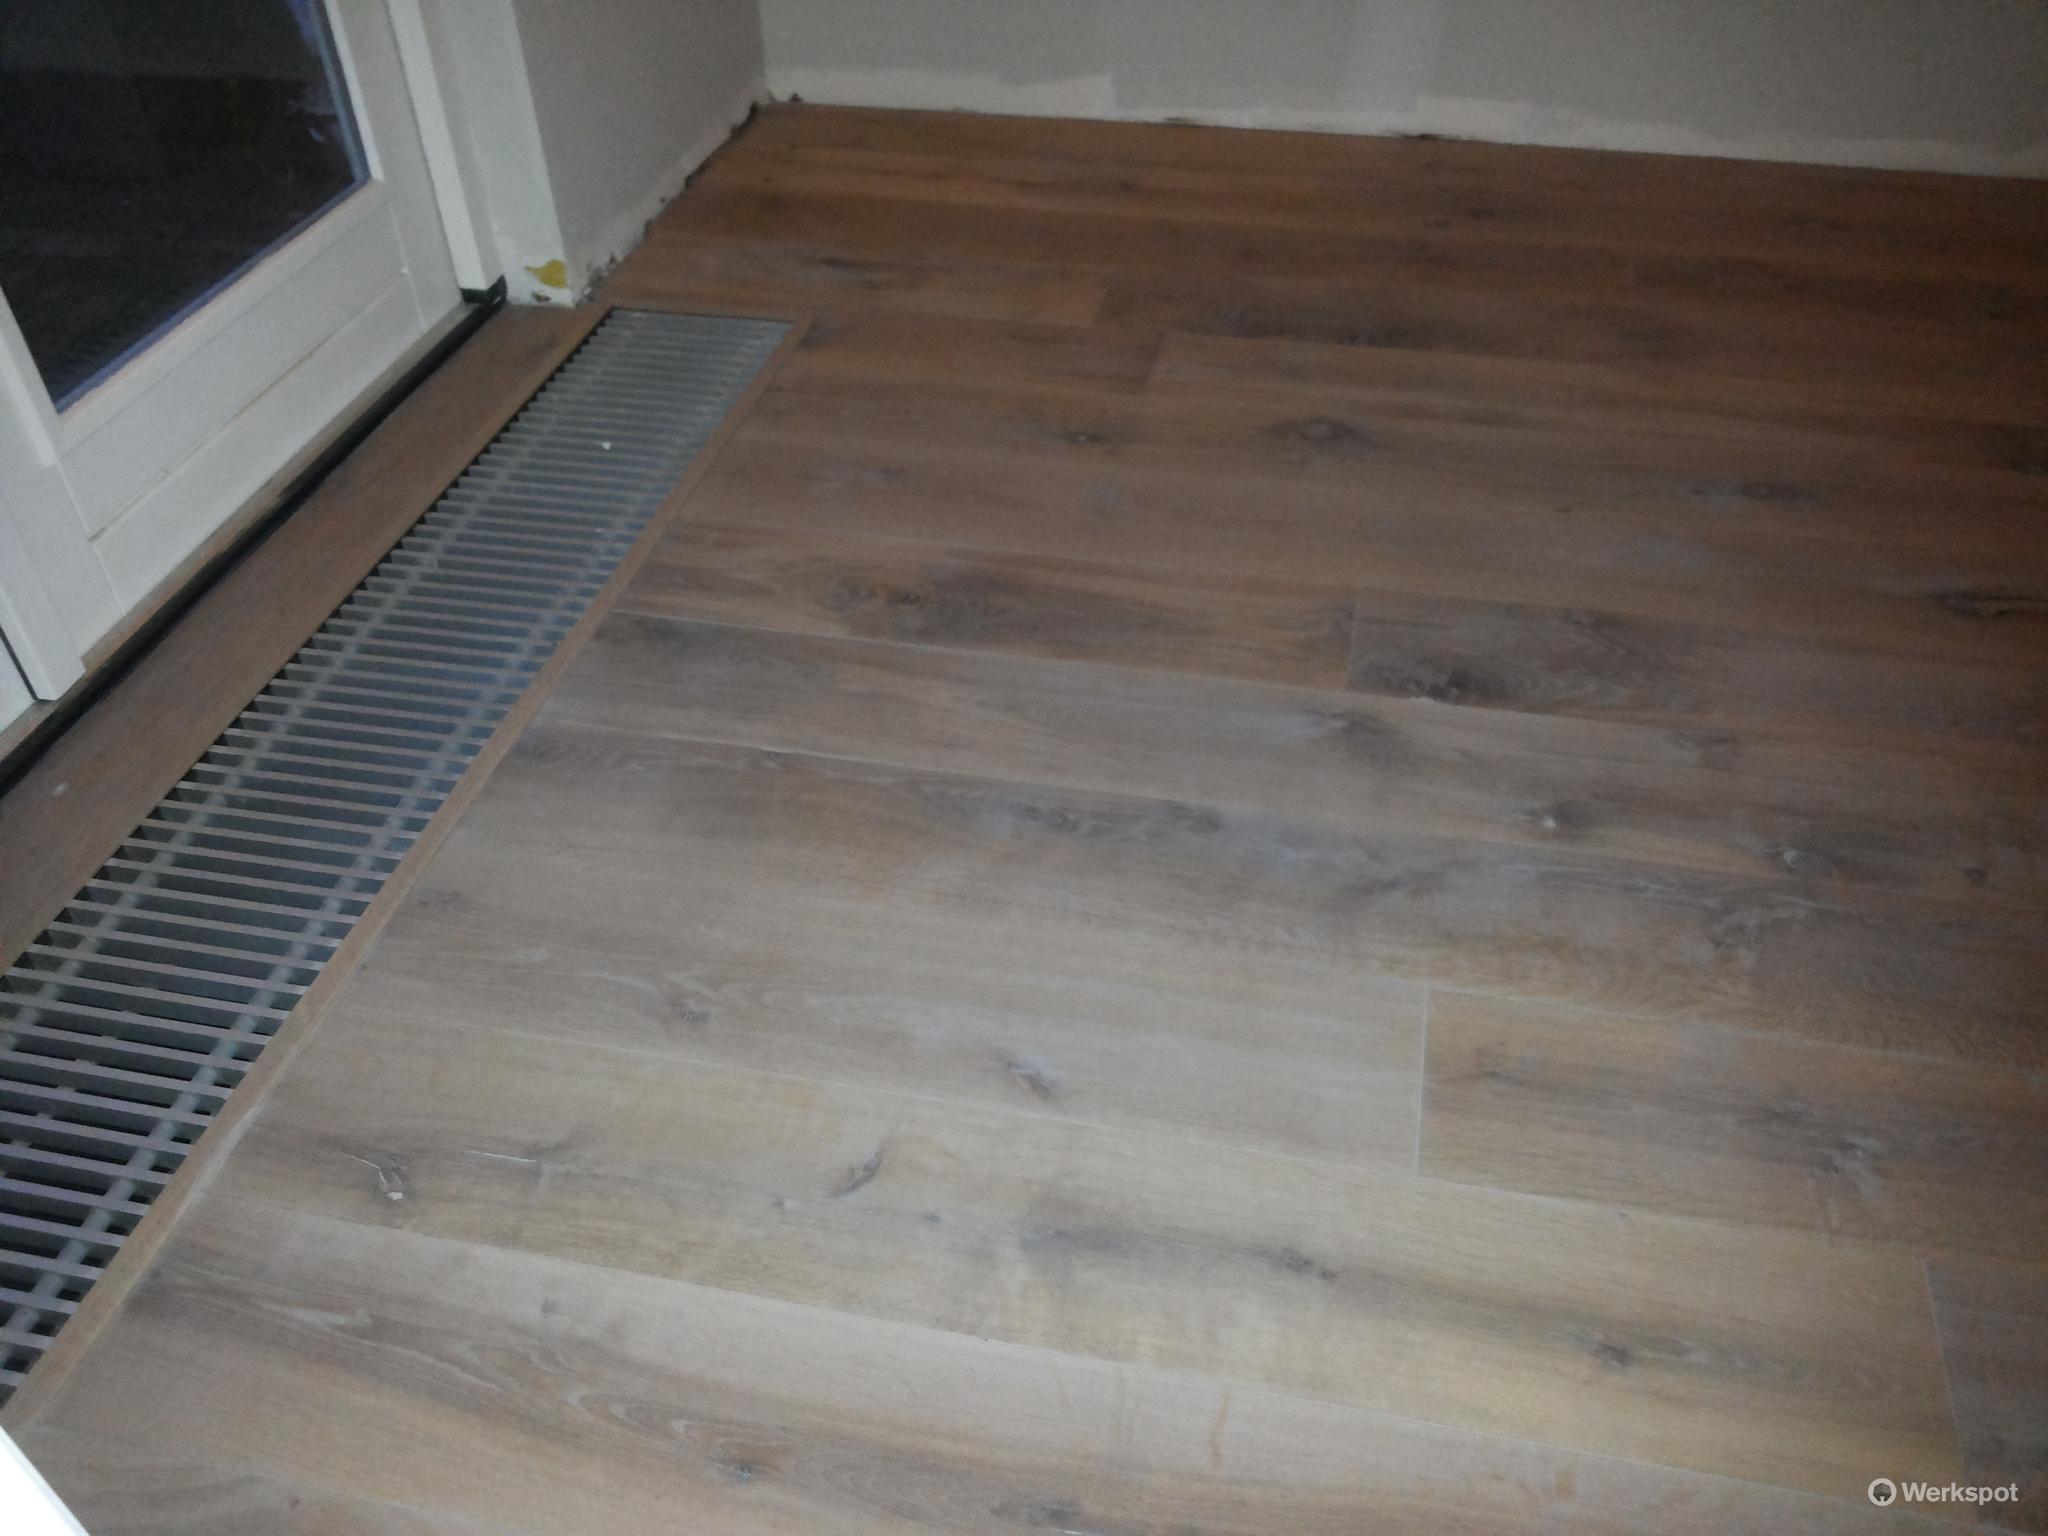 Ikea vloer beschermer stoel: ikea rieten stoel tgx good ikea wall